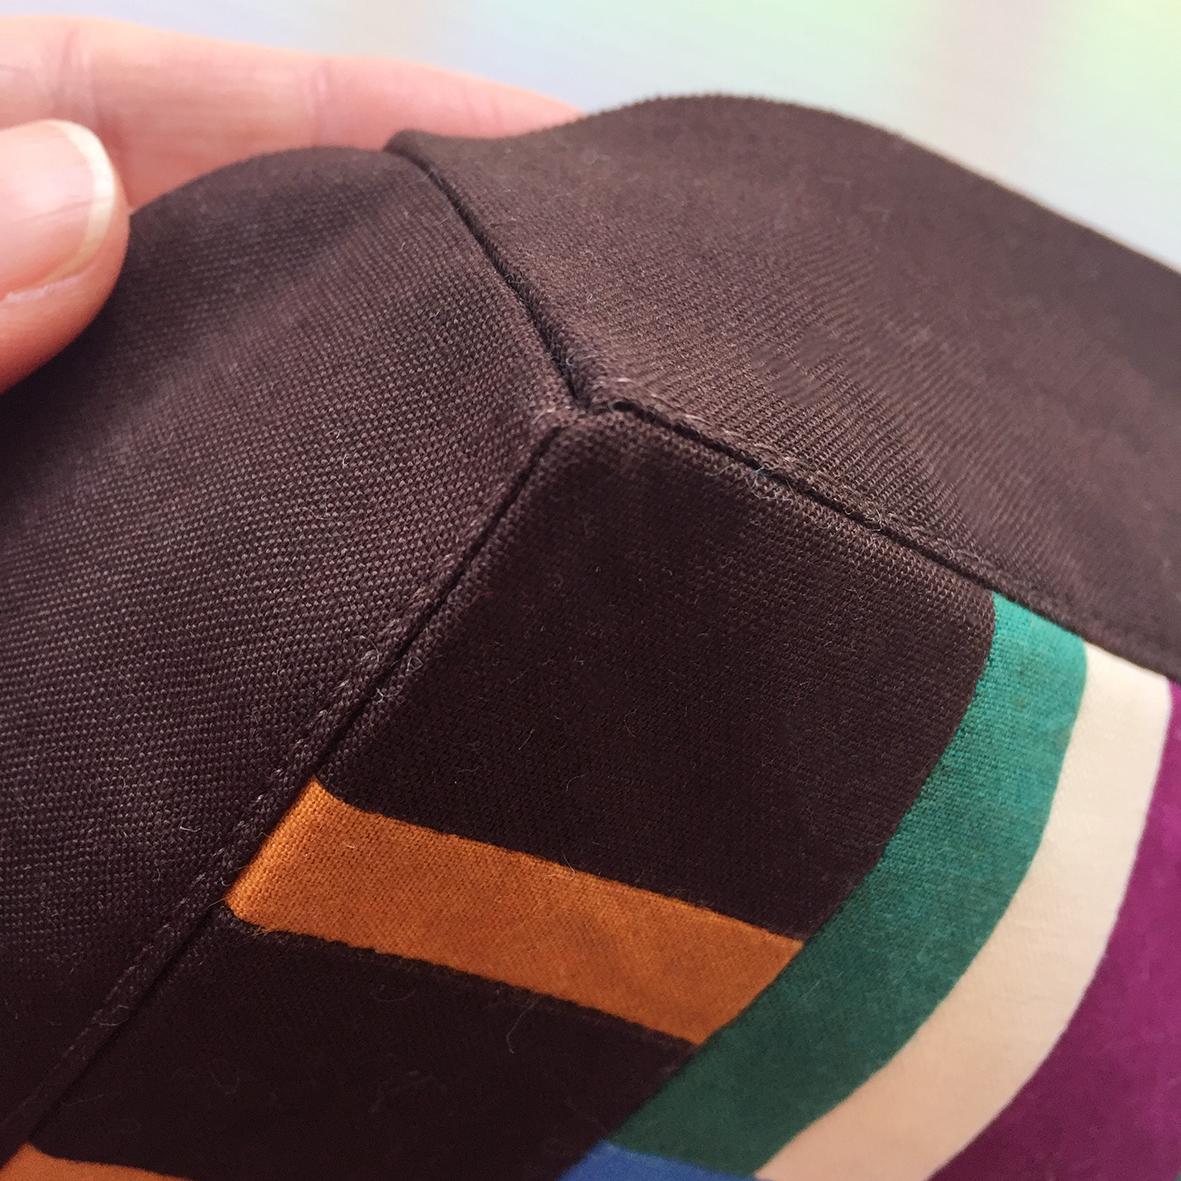 sewn corners